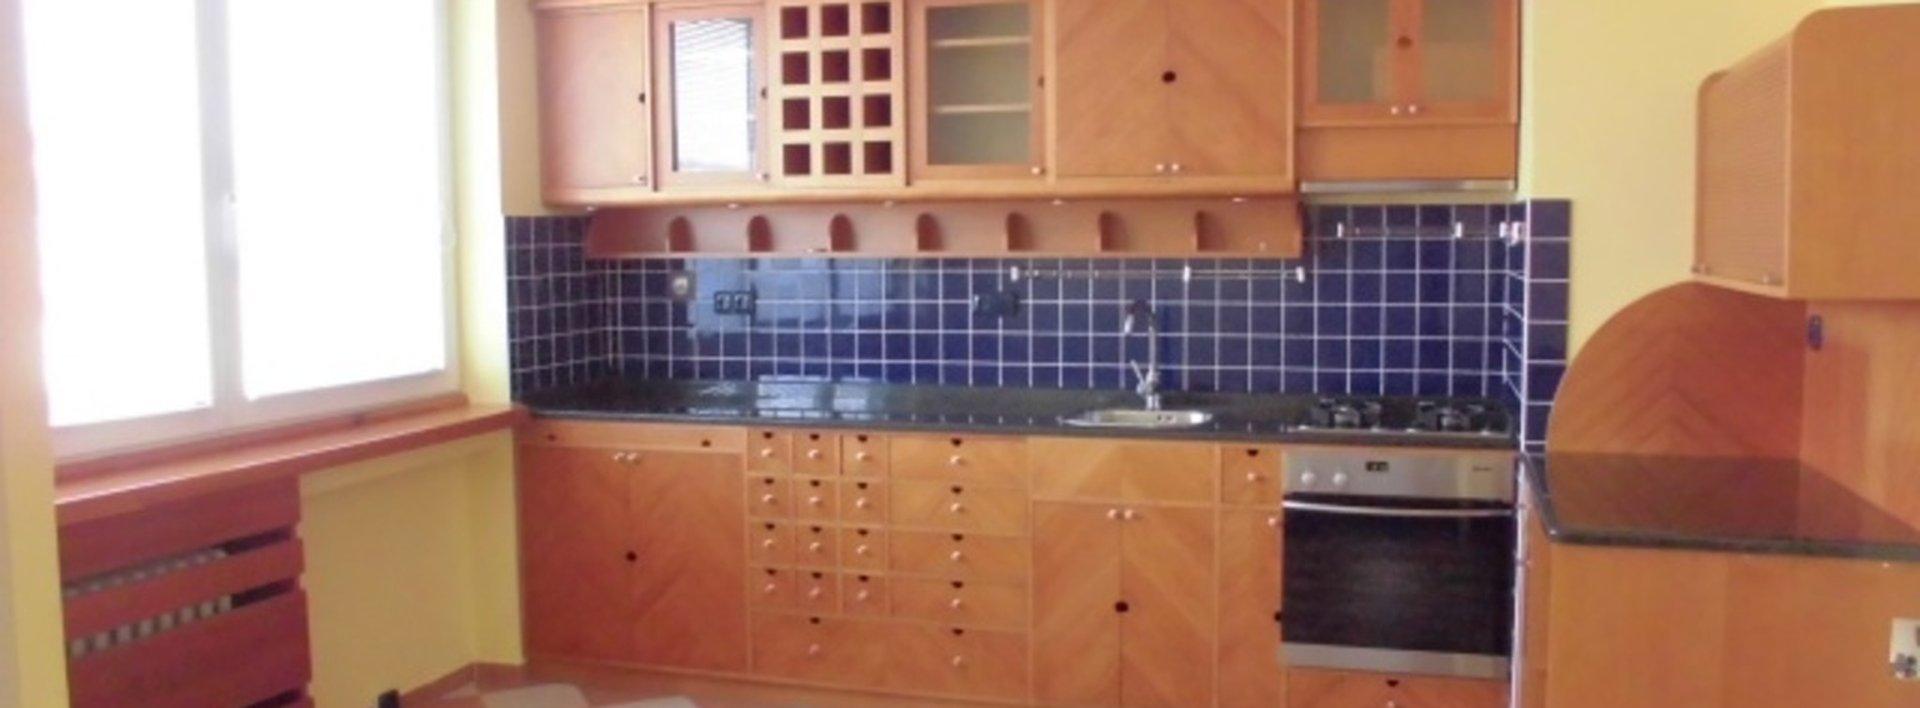 Moderní slunný byt 3+1+L, 80m2, žádaná lokalita Králův Háj, Ev.č.: N46396